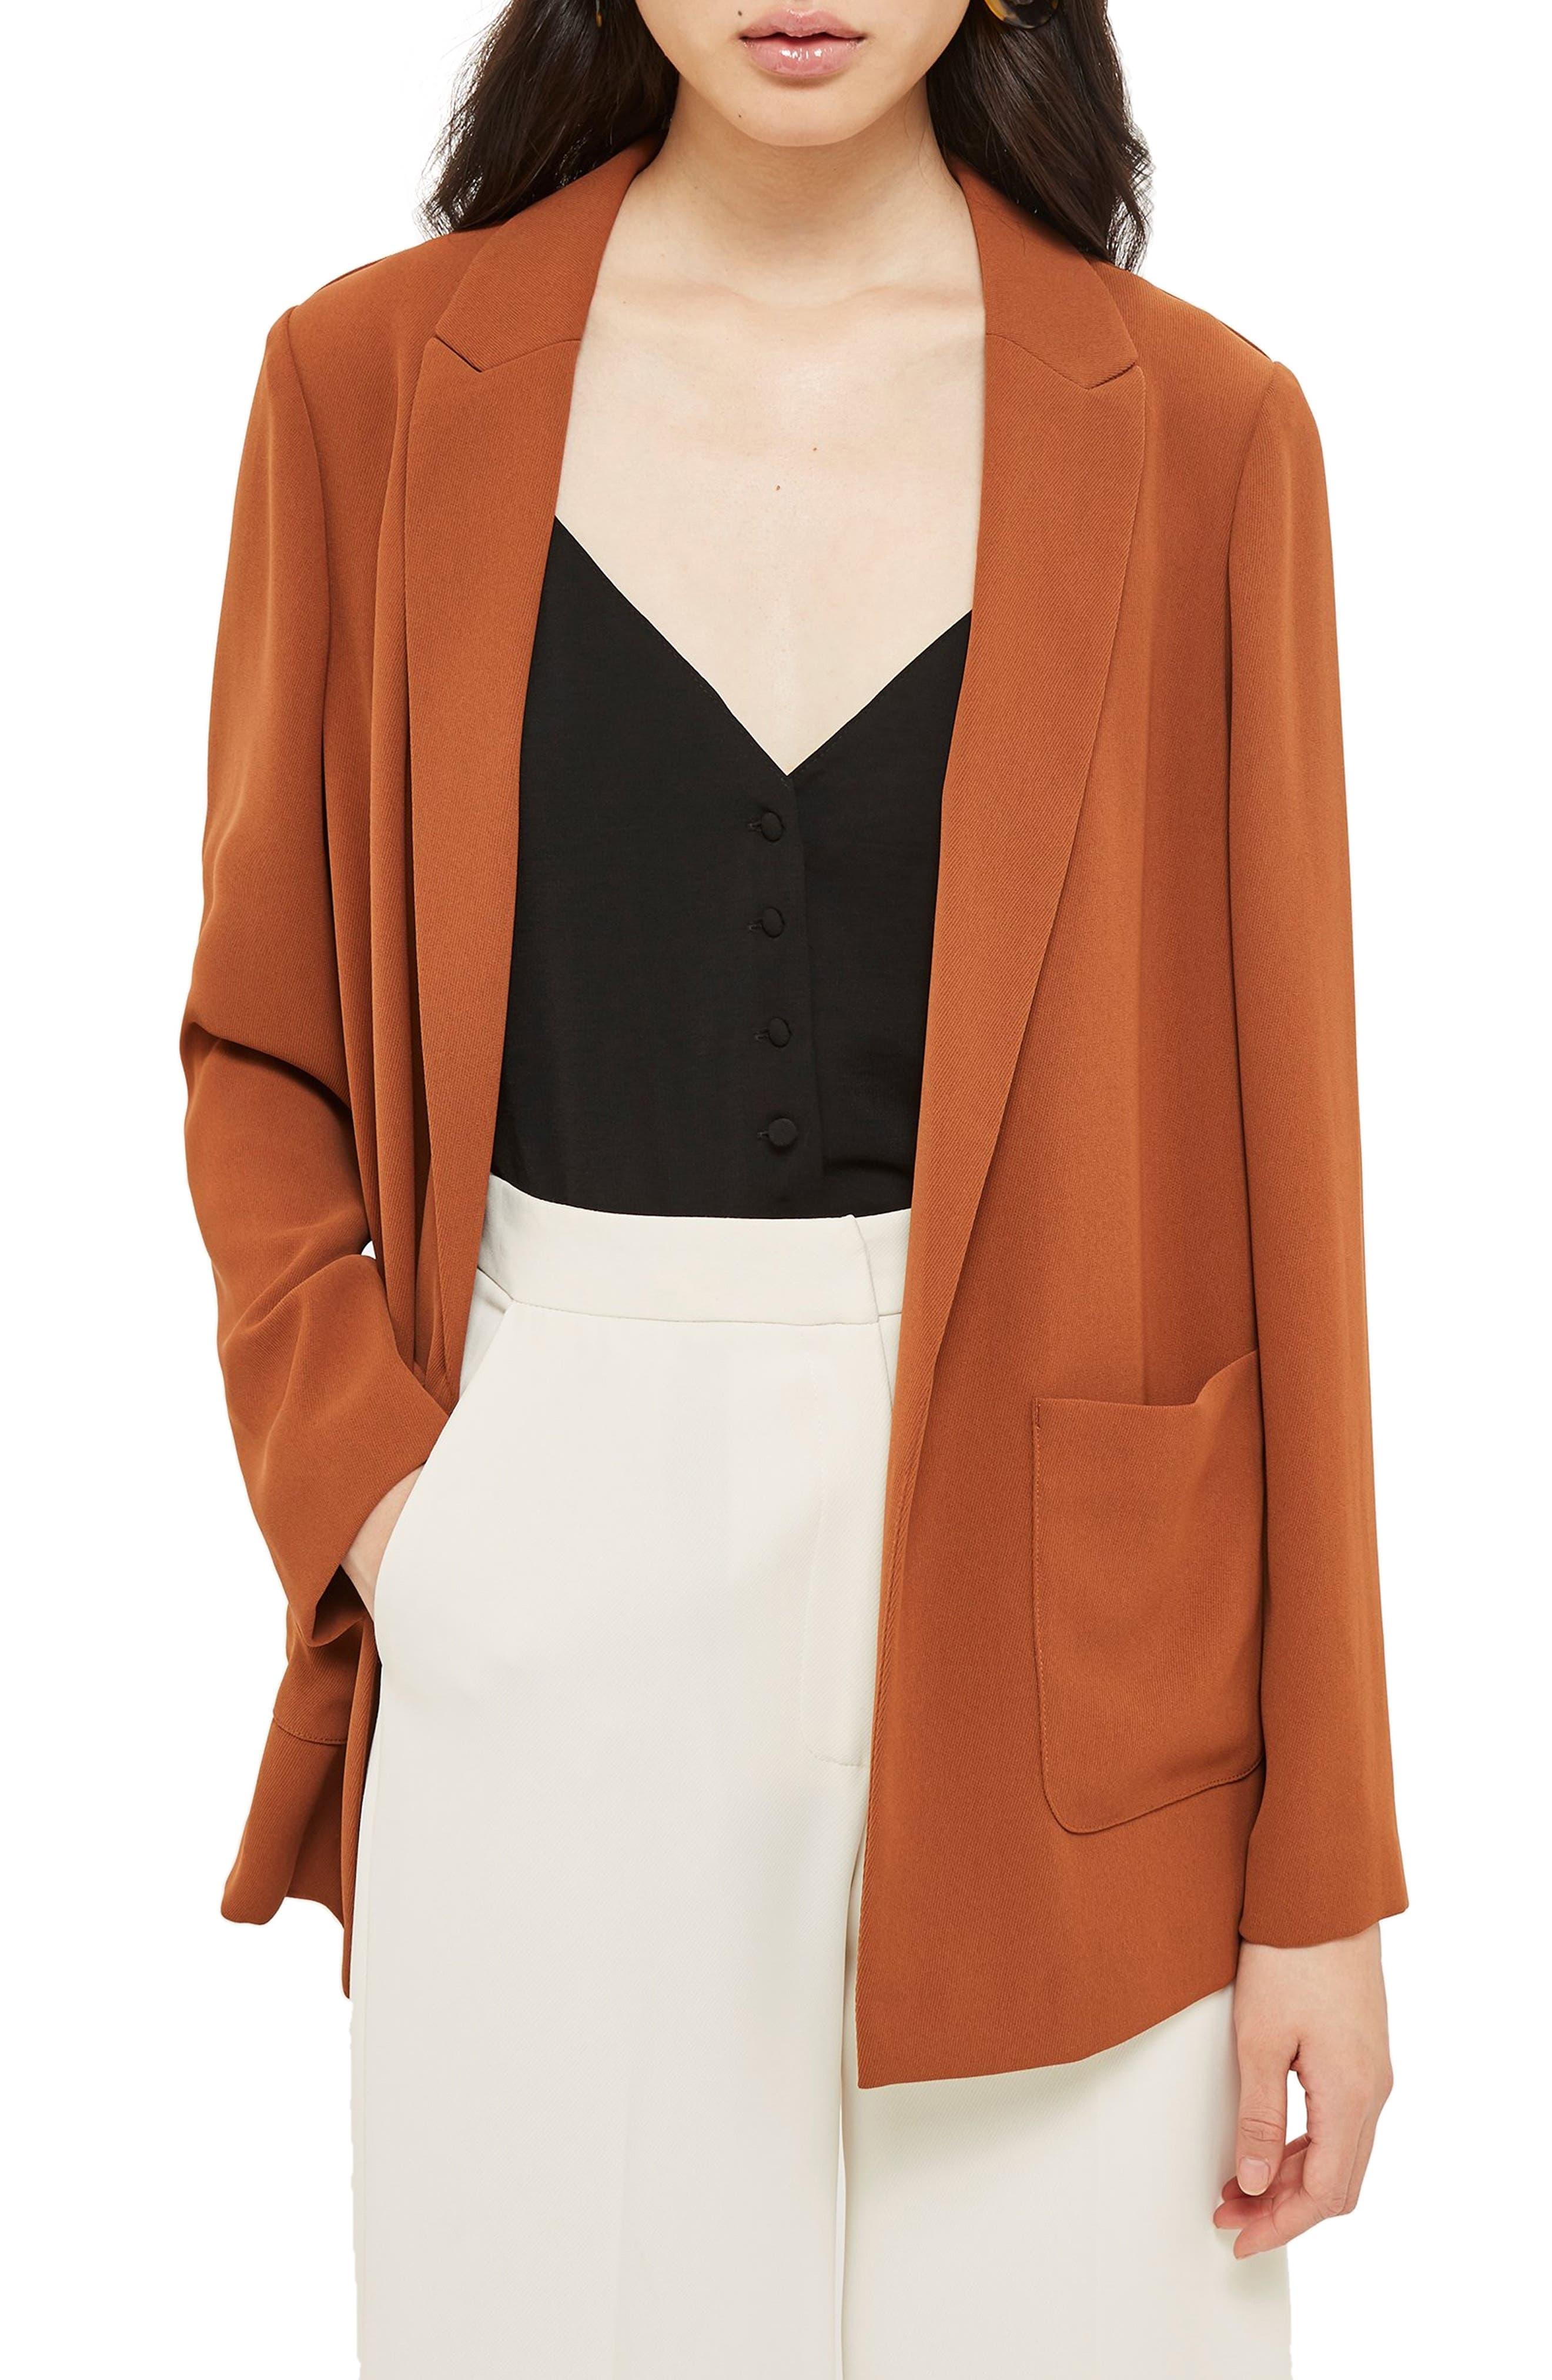 Women's Nordstrom Jackets Coats amp; Topshop CHYq6wxH